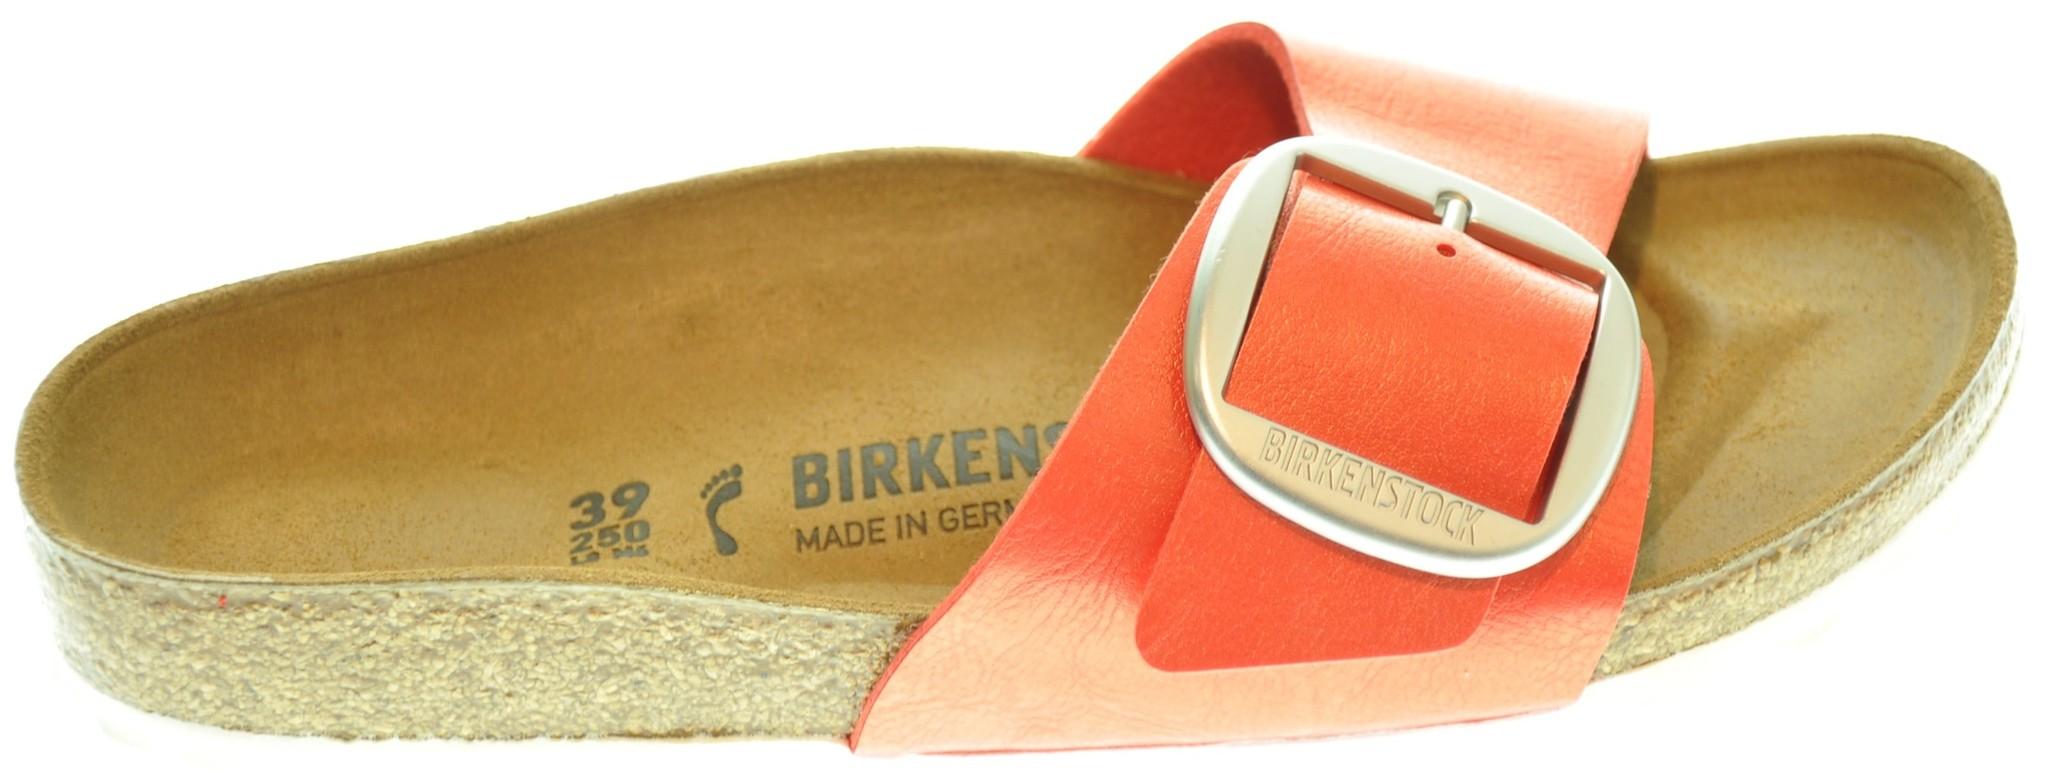 Birkenstock Birkenstock Slipper (36 t/m 41) 201BIR11